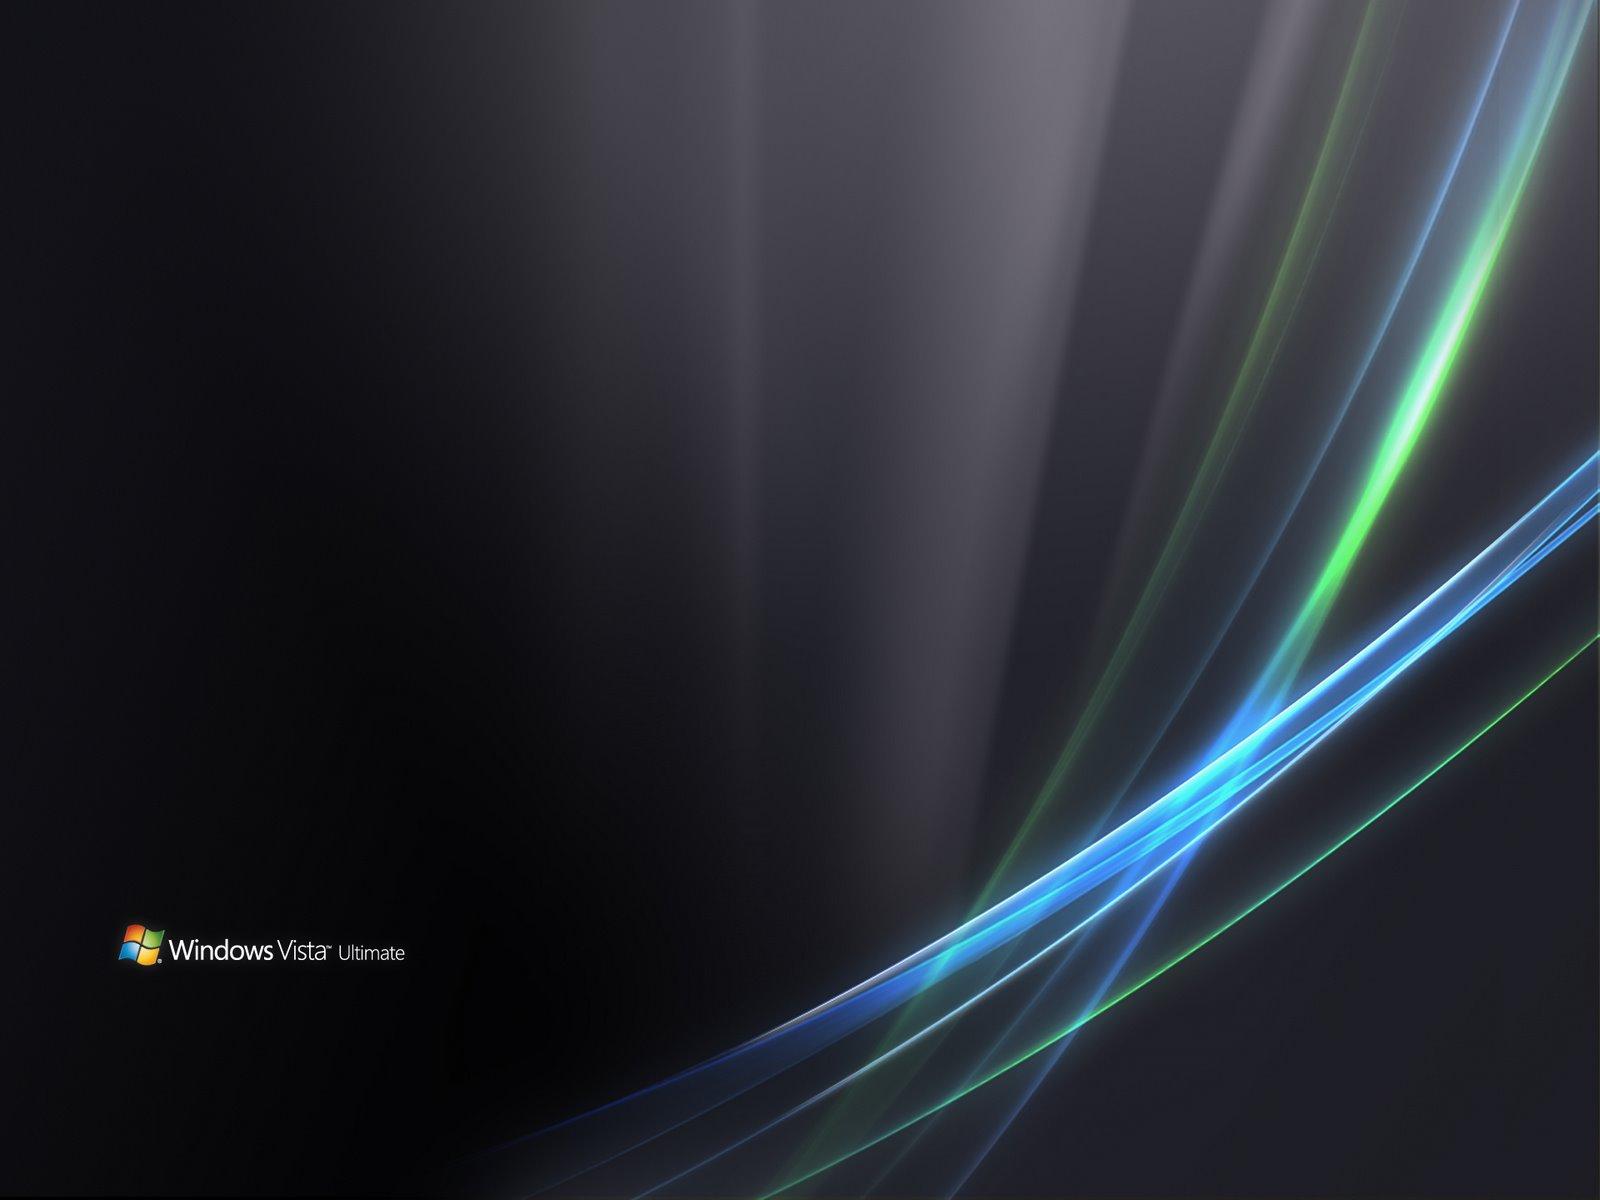 18605 window desktop background 1600x1200